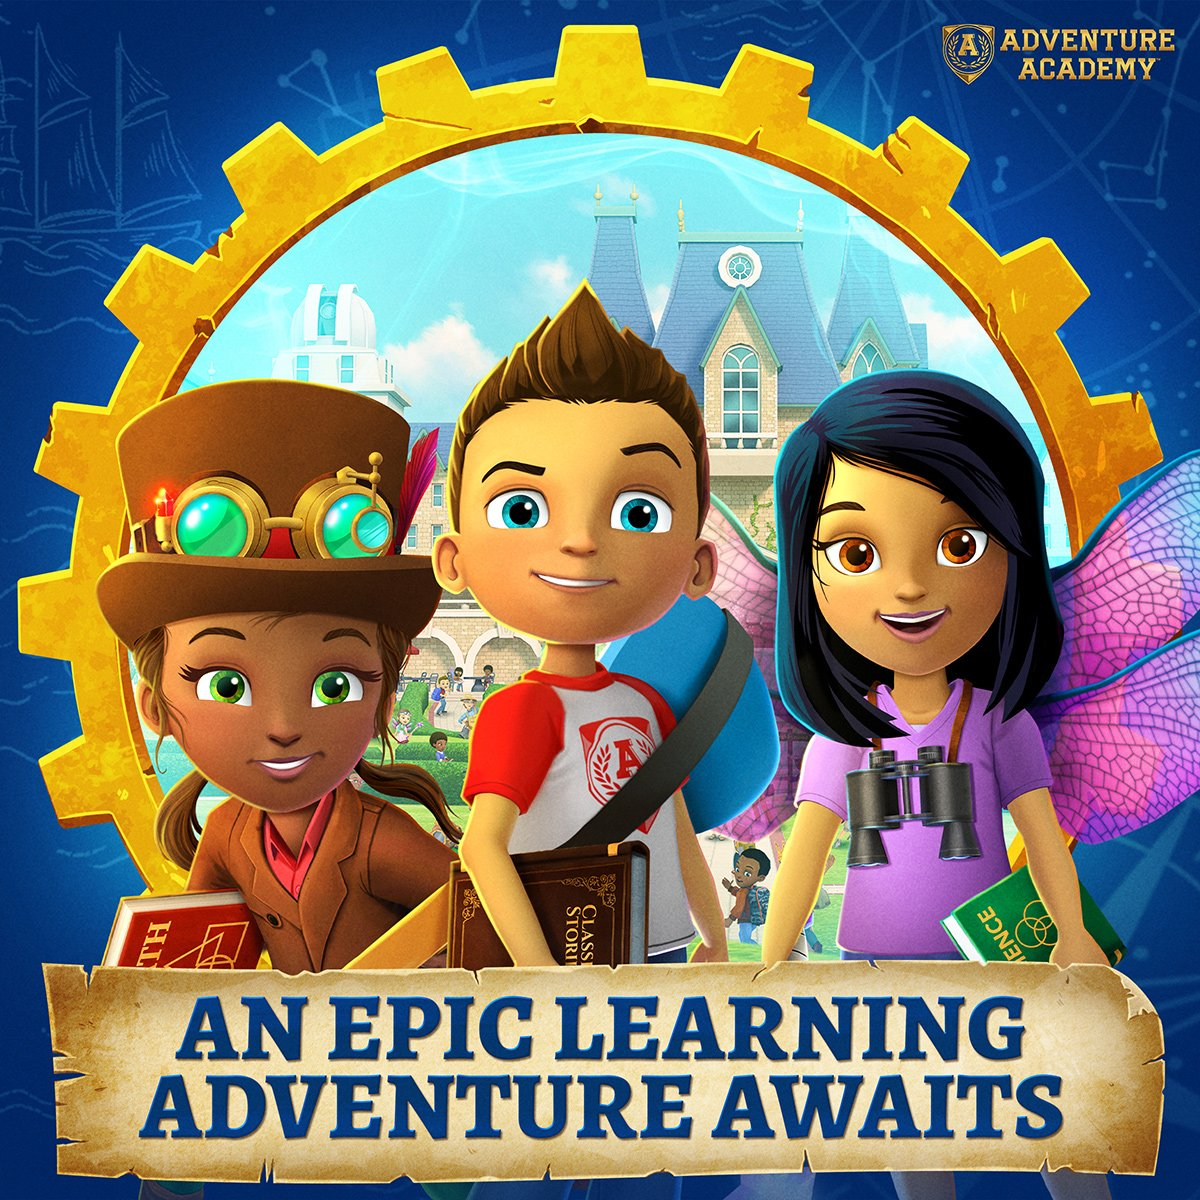 Adventure Academy (@AdvAcademyUS) | Twitter